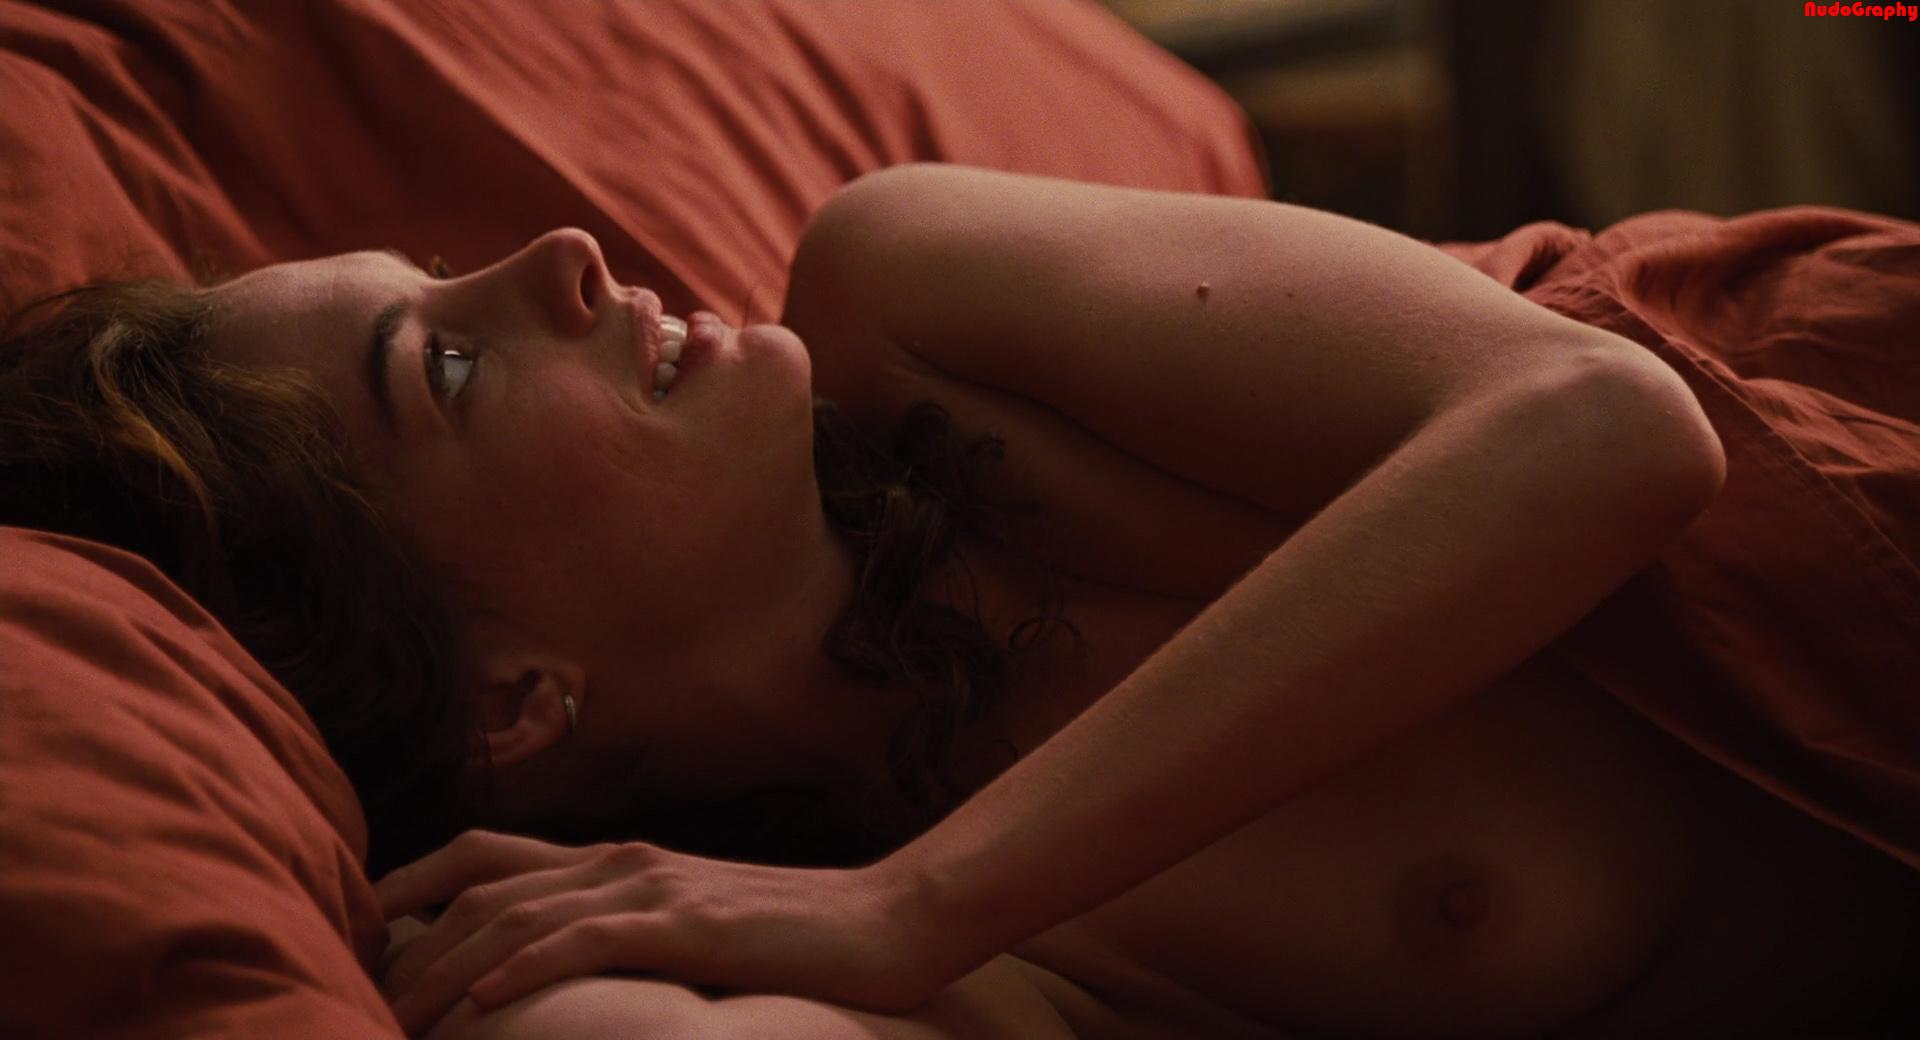 Nude In Hotel Erotica